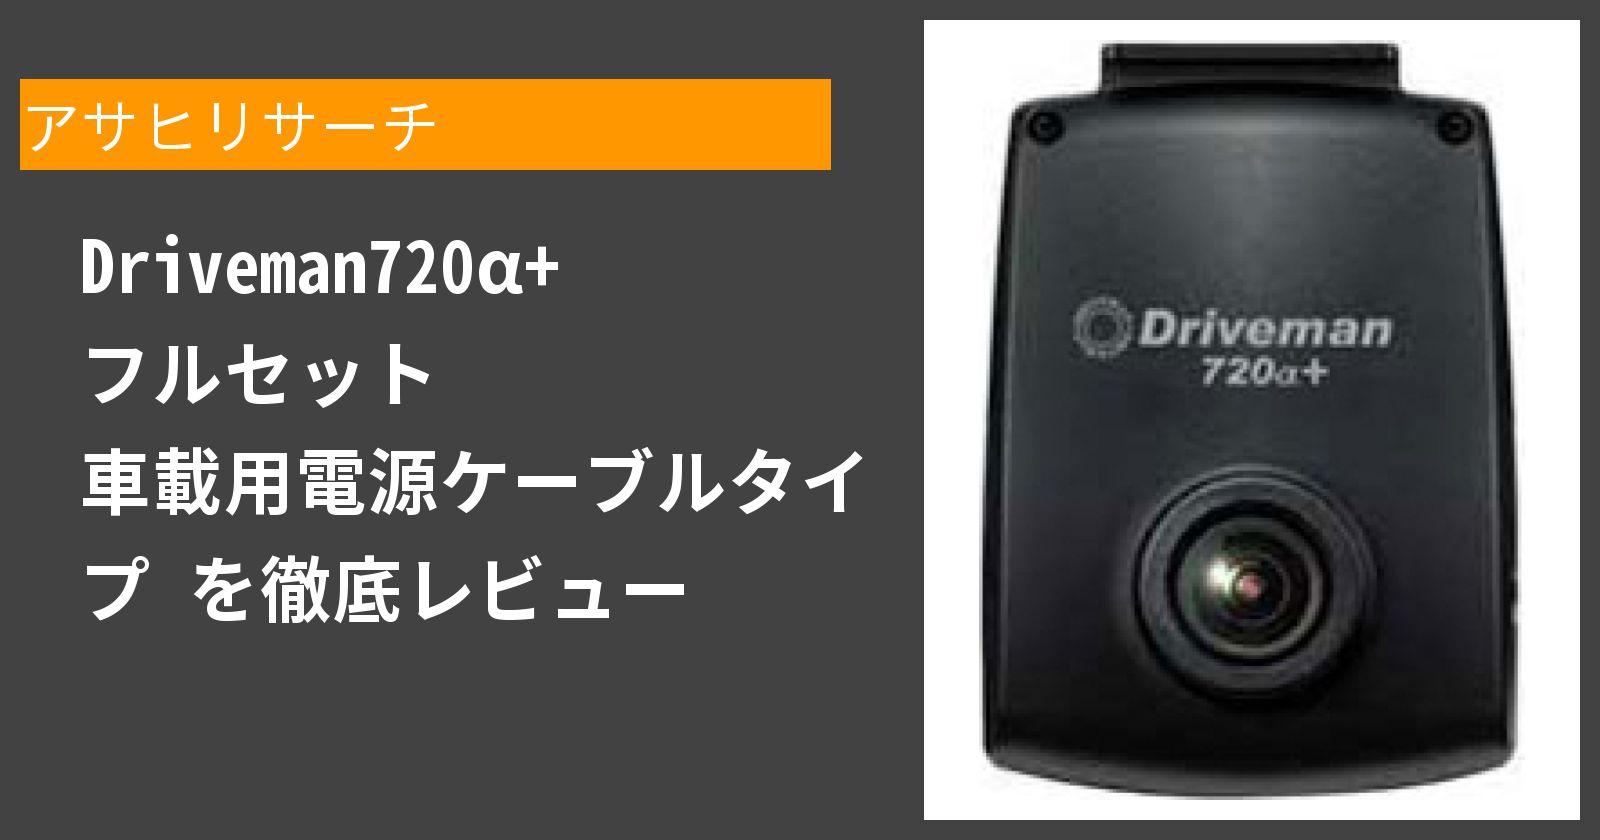 Driveman720α+ フルセット 車載用電源ケーブルタイプを徹底評価